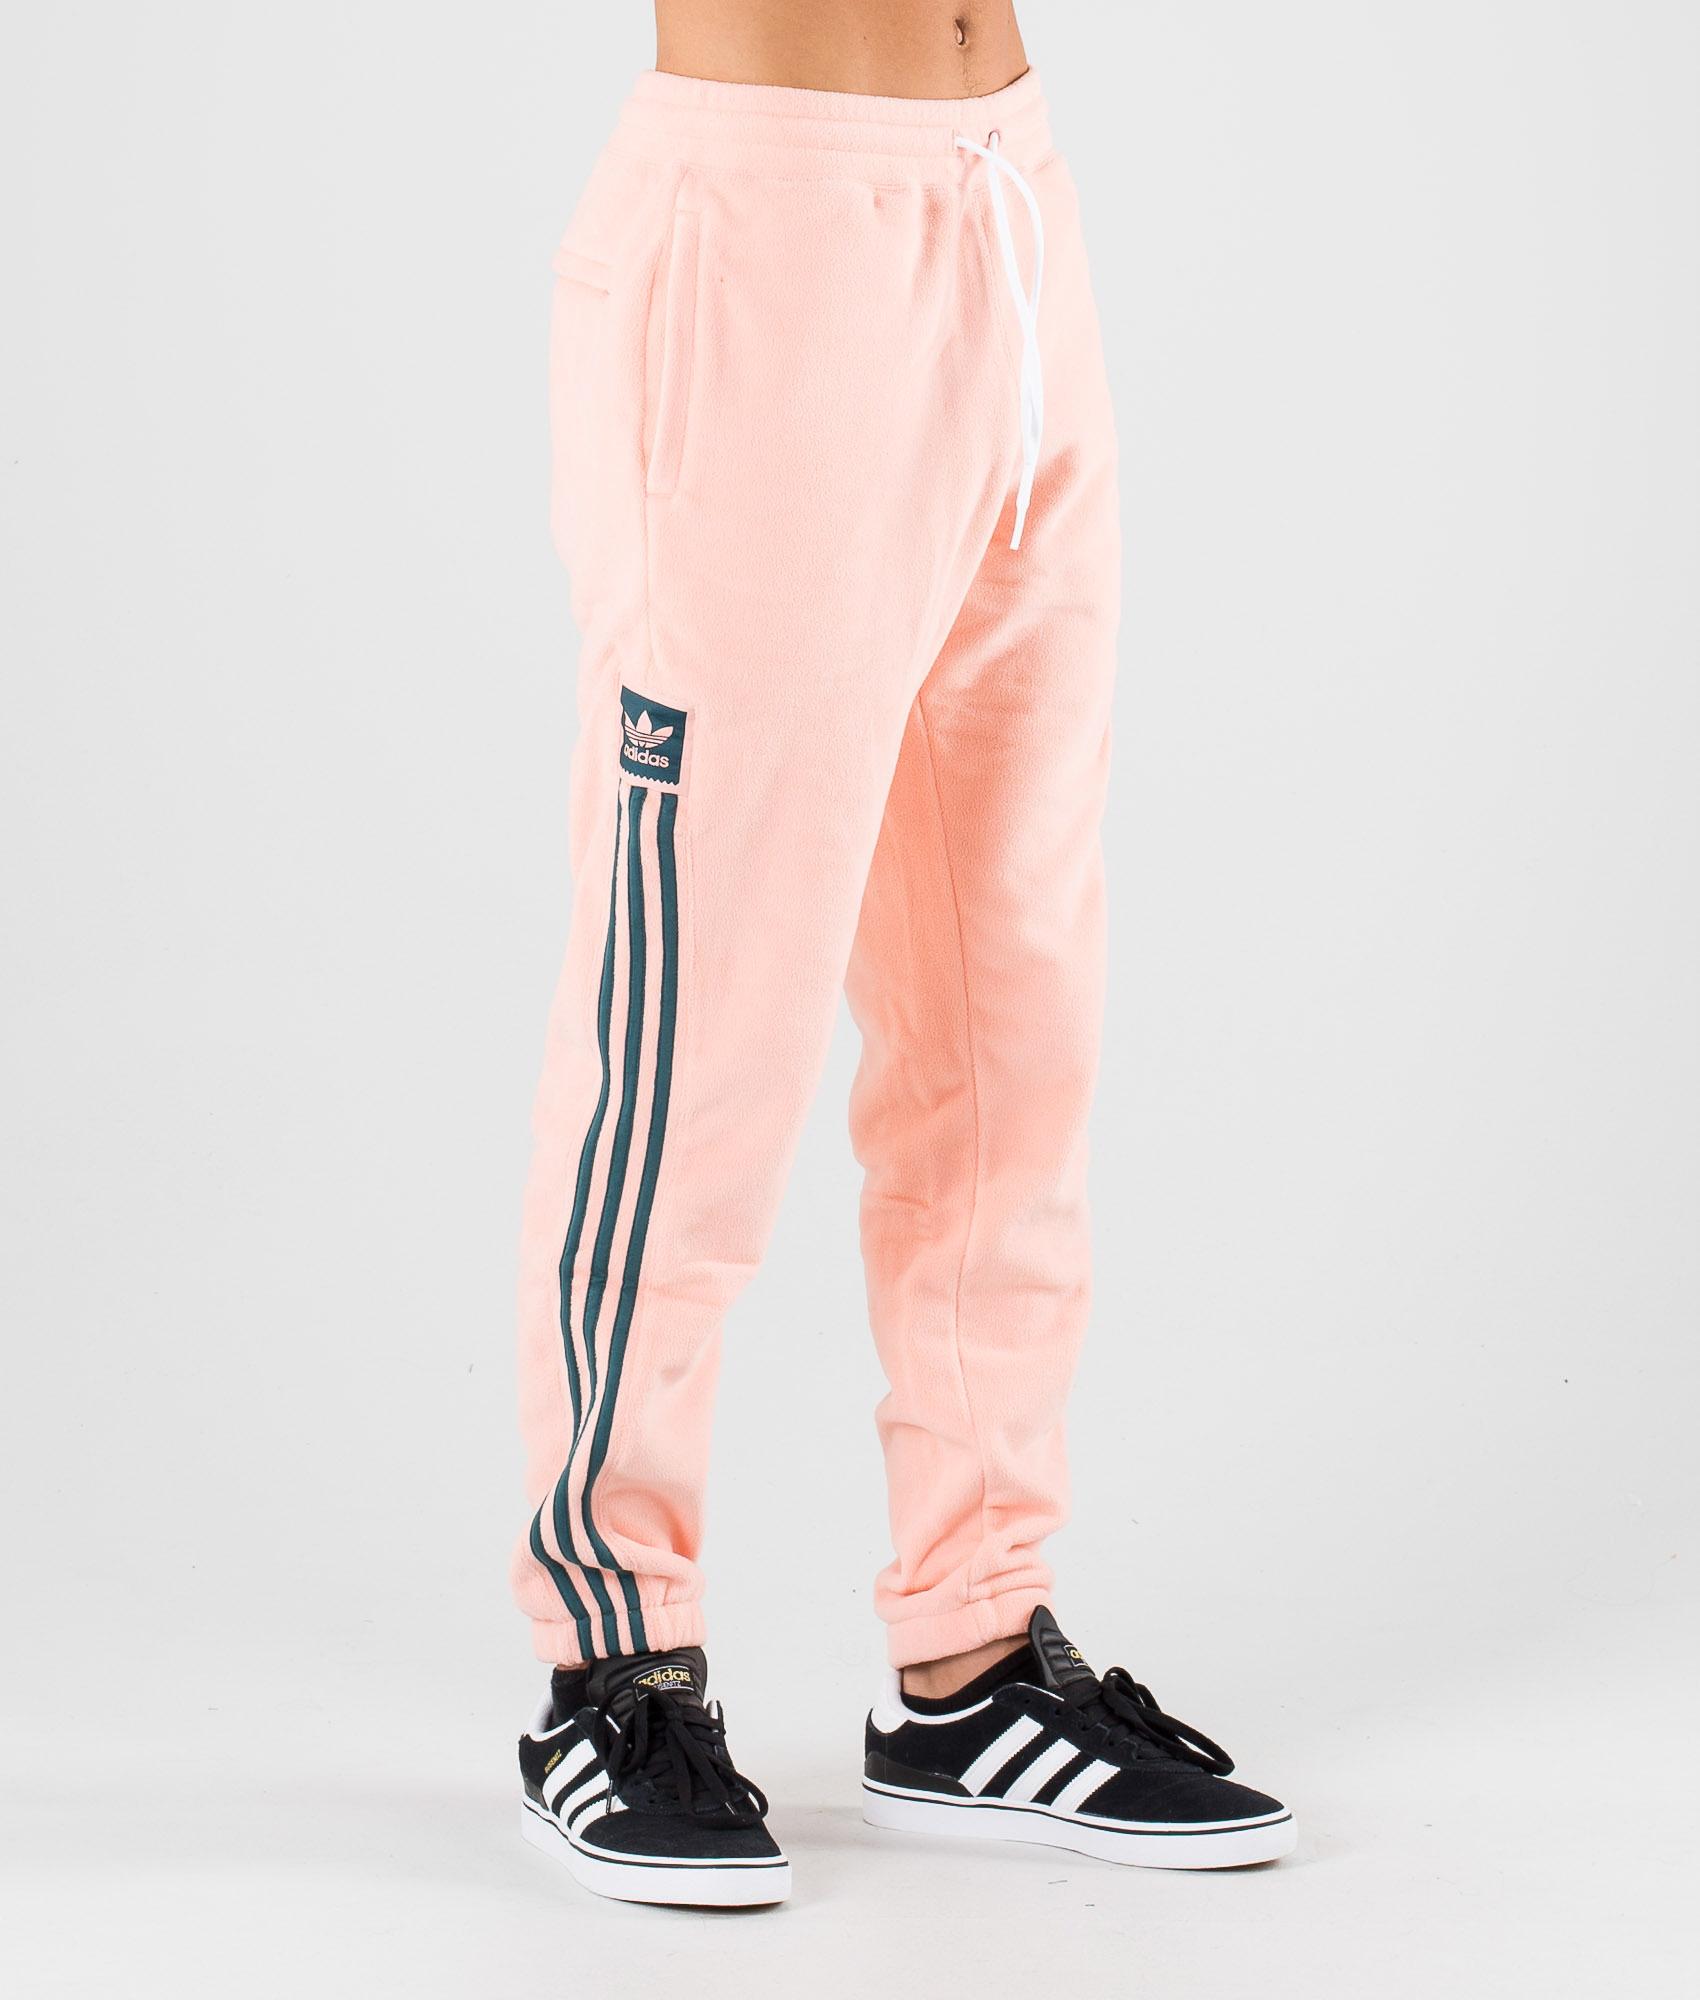 Adidas Skateboarding Grid Pantalon Glow PinkViridian